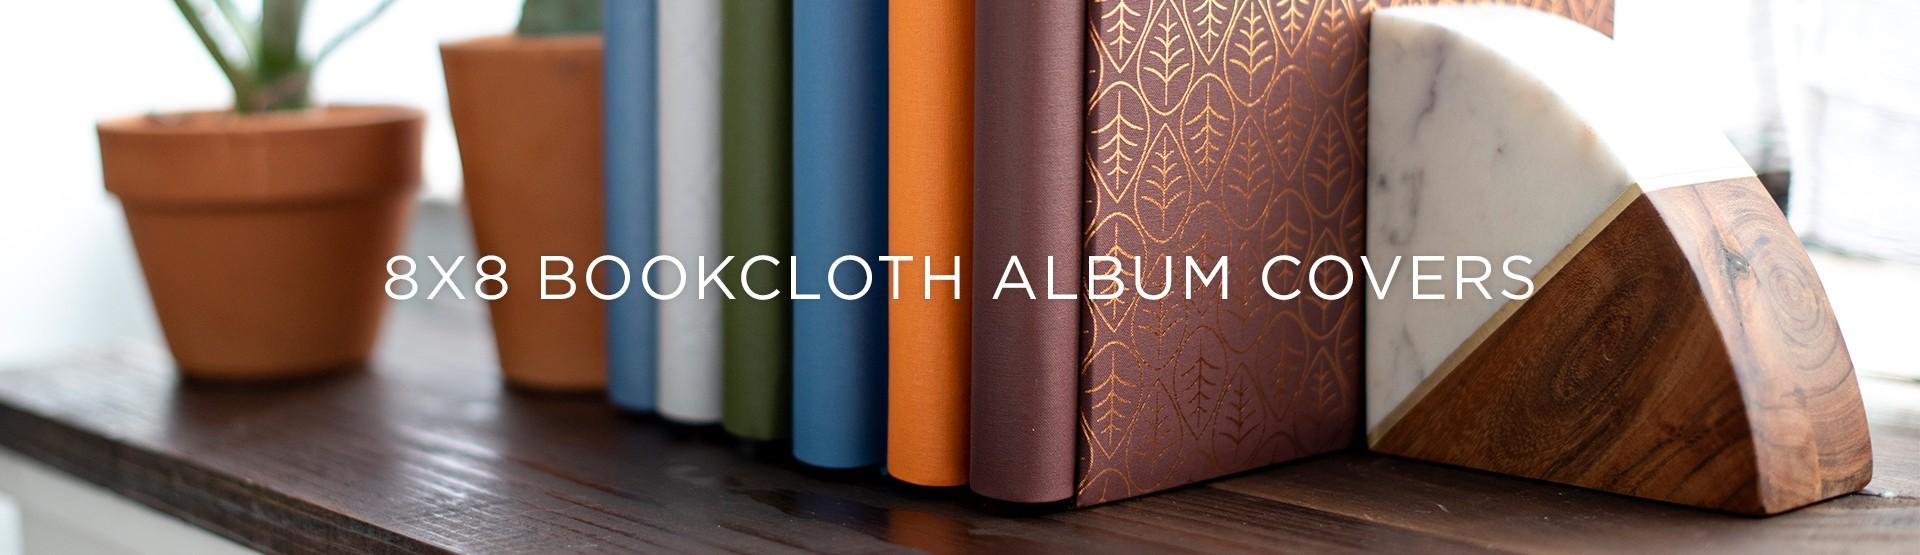 8x8 Bookcloth Album Covers